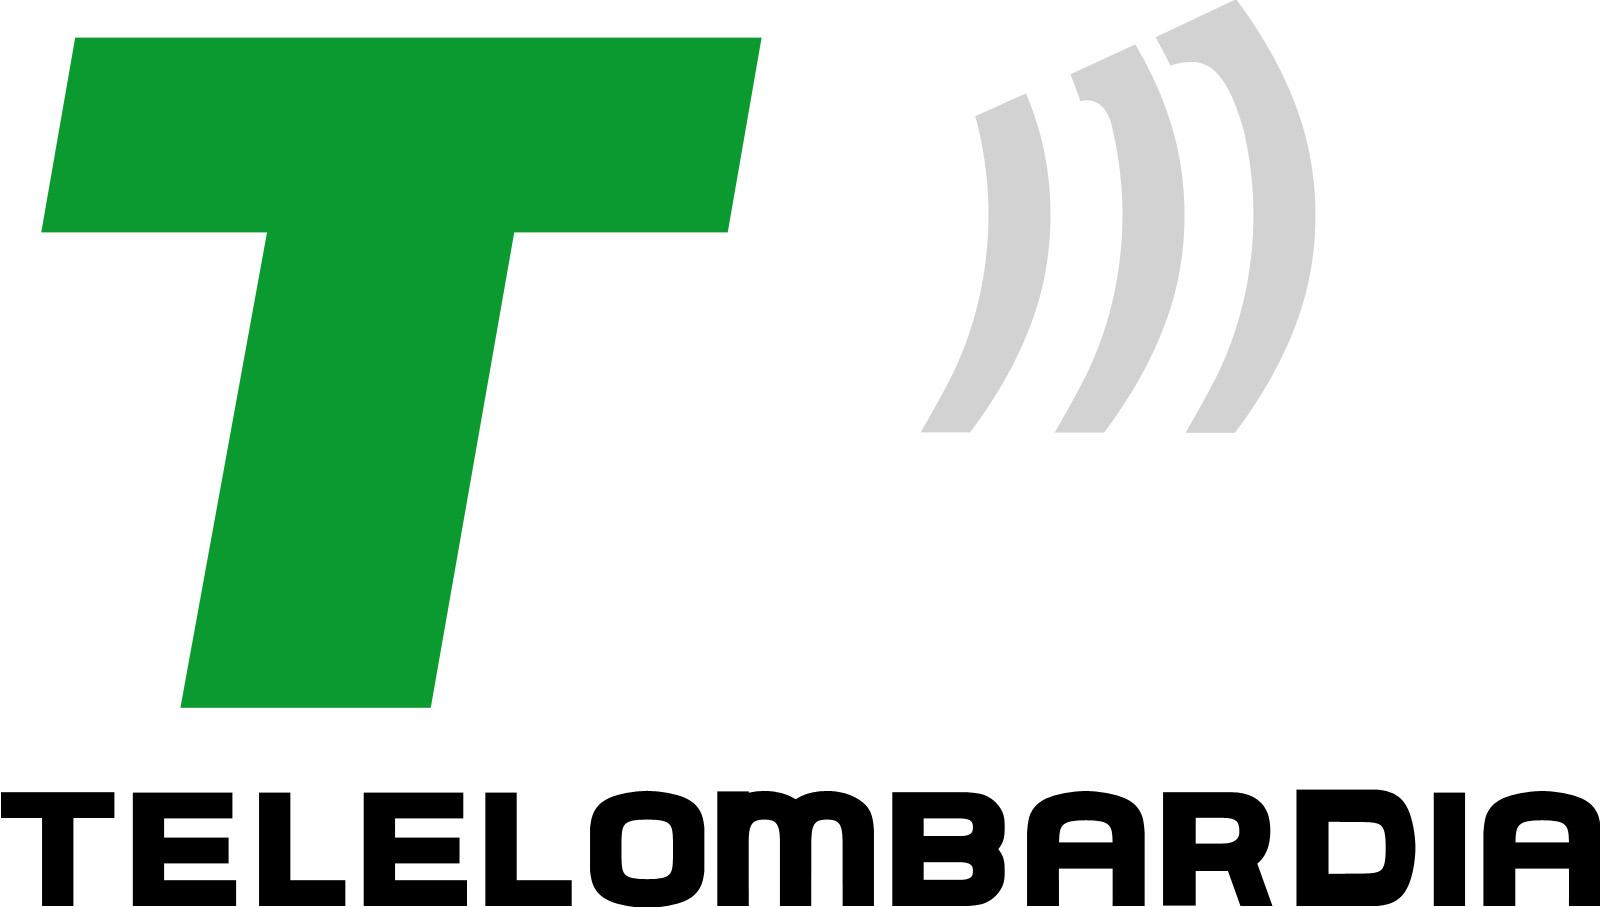 telelombardia logo